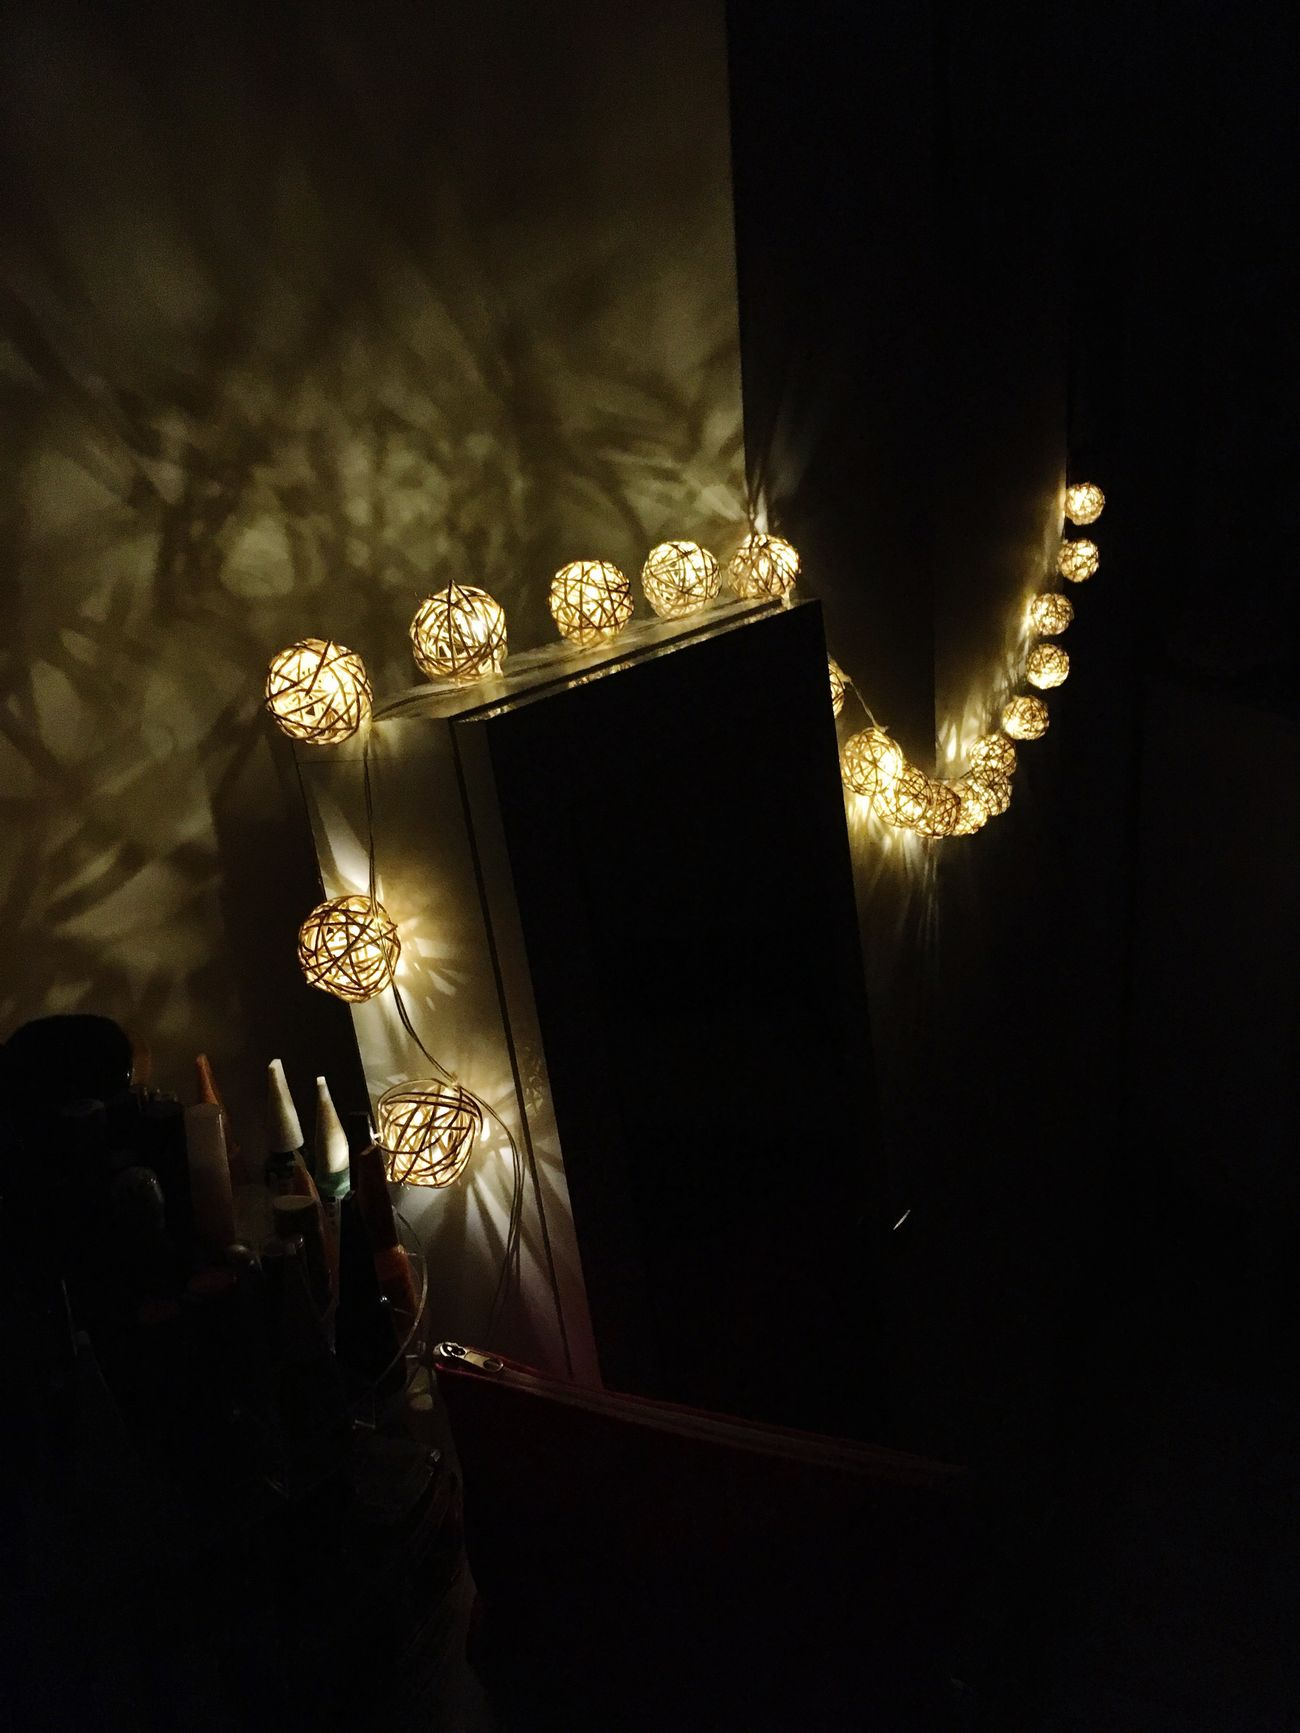 Lighting Equipment Illuminated Night No People Indoors  Close-up Bedroomlight Romantic Light And Shadow